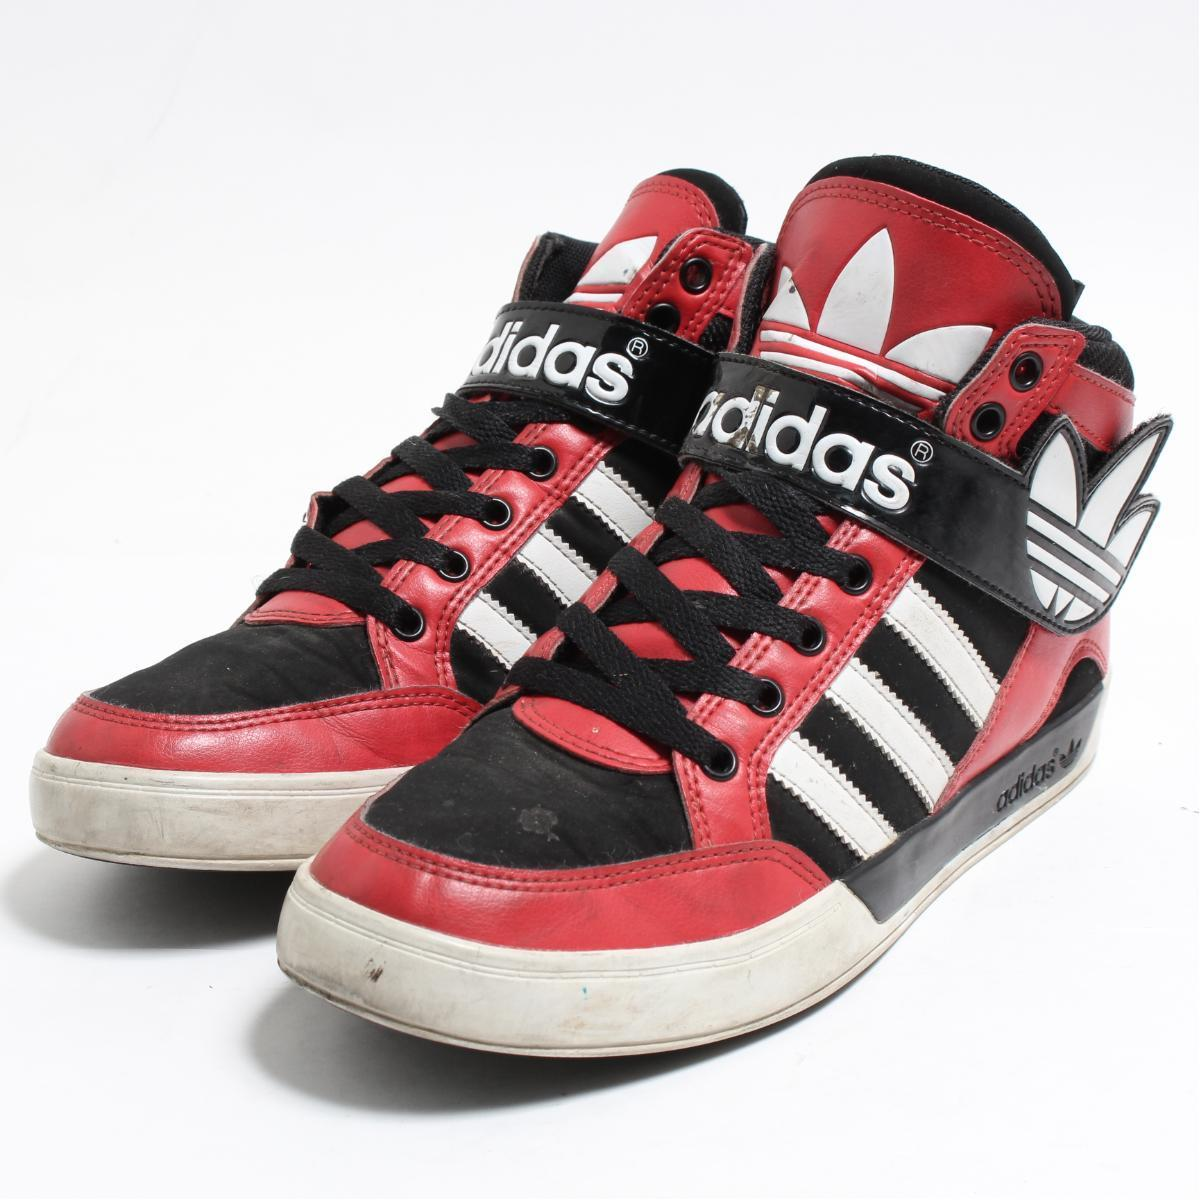 low priced 0f5ca 3dbe7 Adidas adidas Hard Court 2 sneakers US6 Ladys 23.5cm bon9195